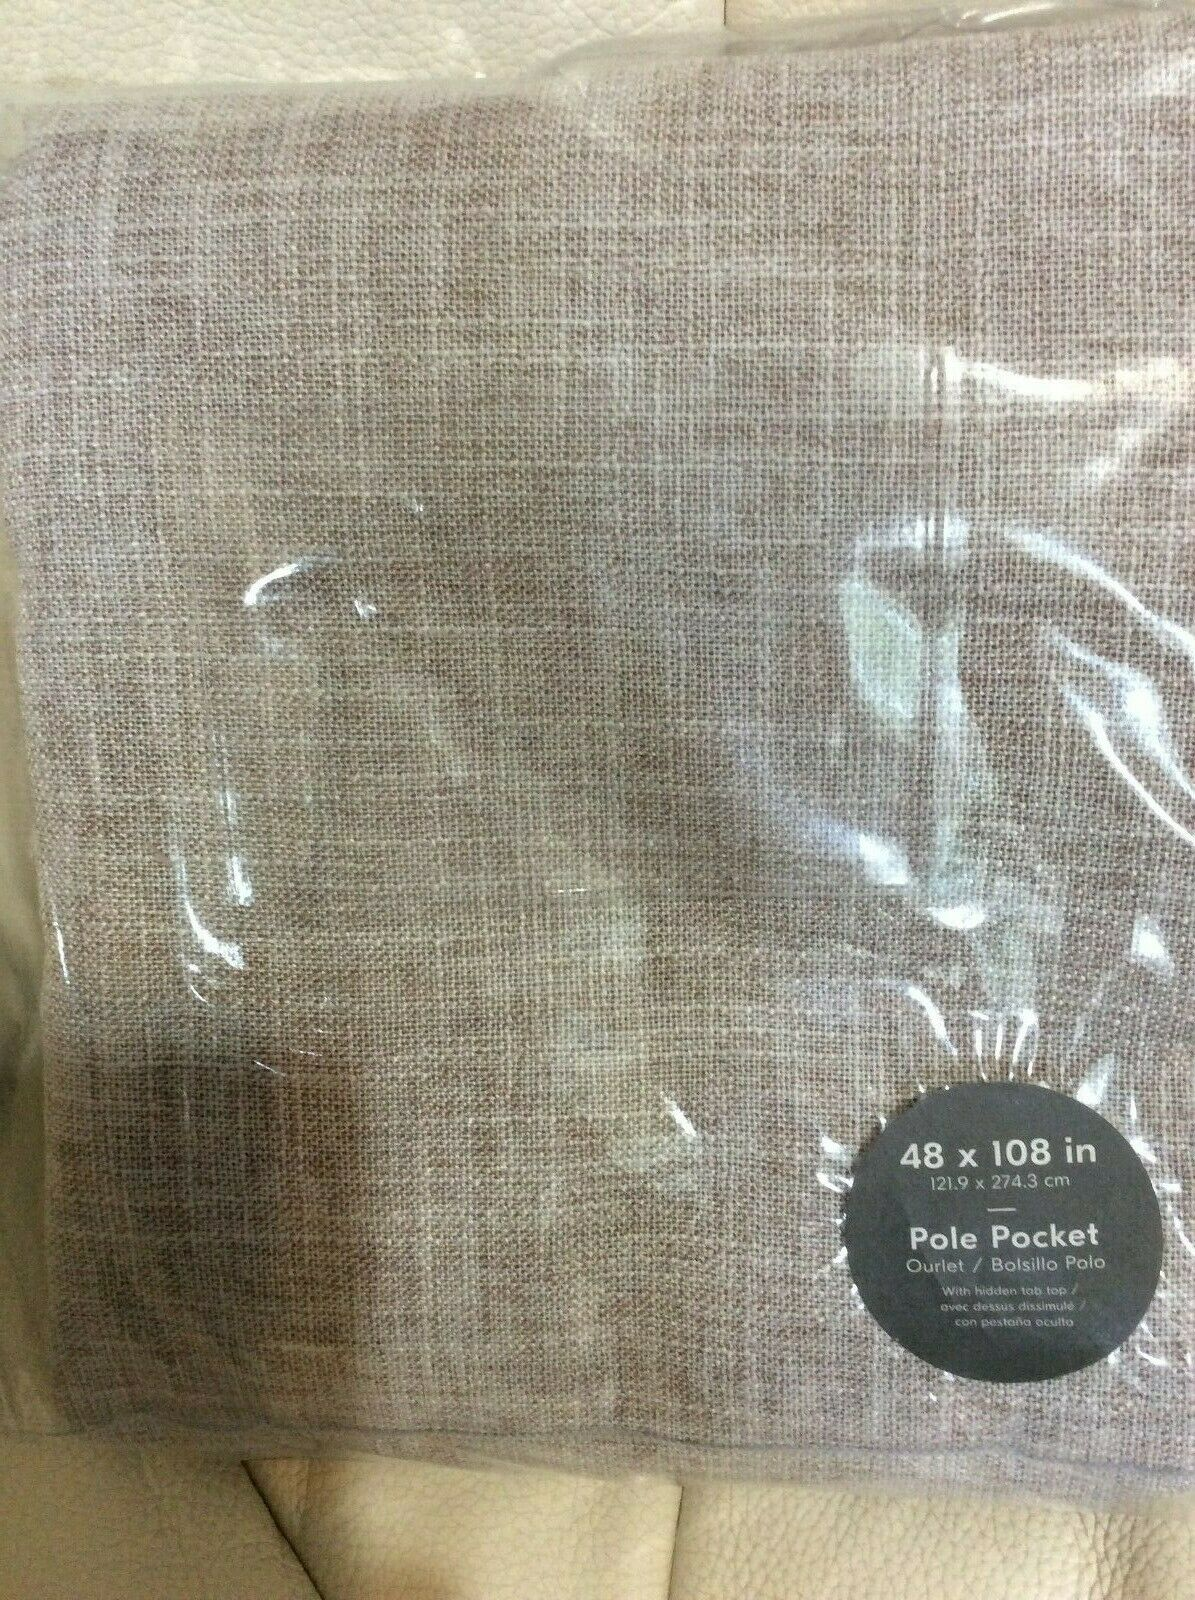 West Elm One (1) Crossweave Curtains 48x108 48x108 48x108 NWT Dusty Blaush Unlined 9160c1